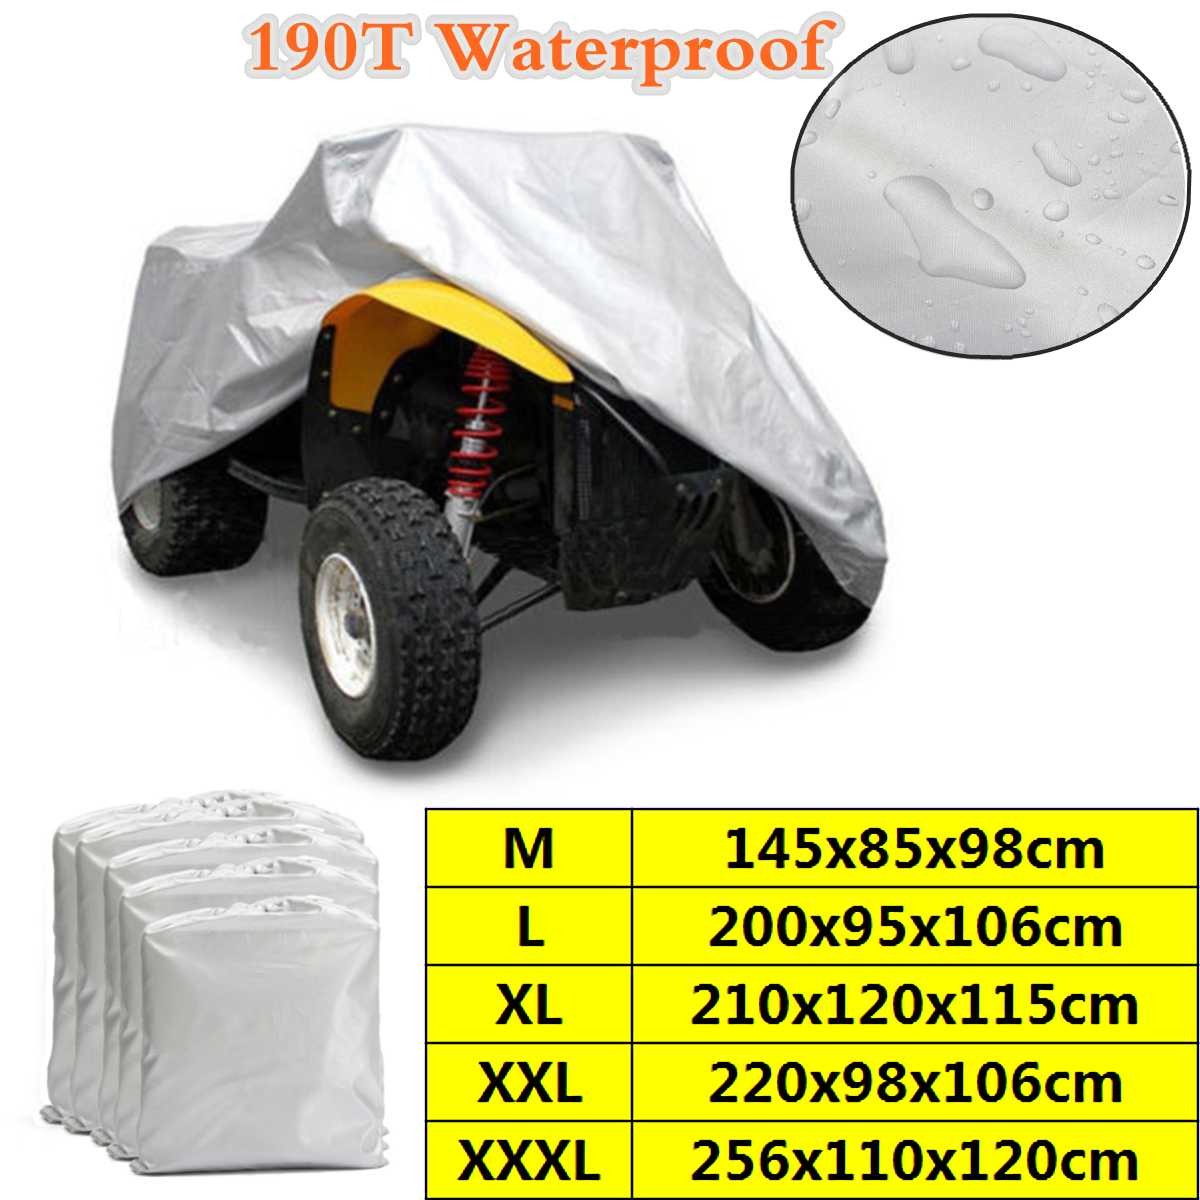 M-XXXL 190T ATV Cover Waterproof Anti-UV Quad ATV Vehicle Scooter Motorbike Car Clothing Sun Cover Rain Cover